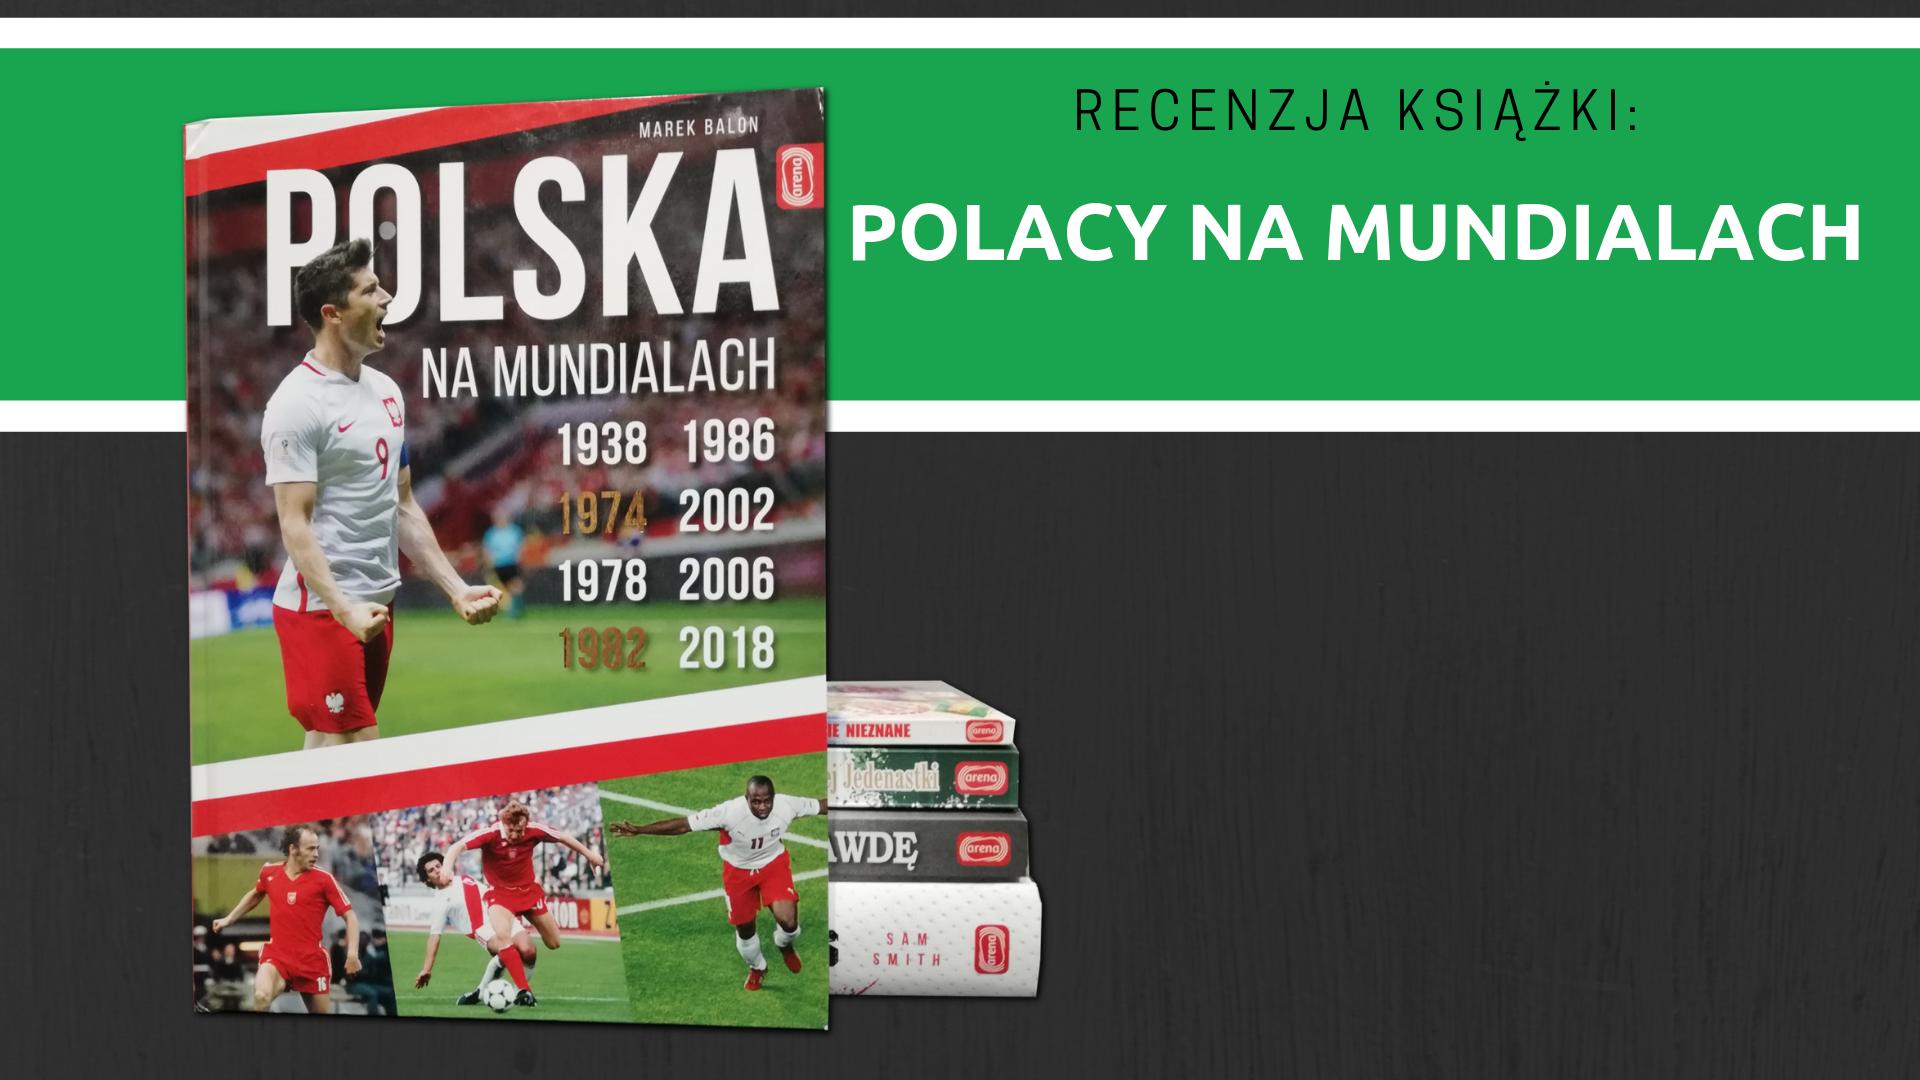 Polacy na mundialach